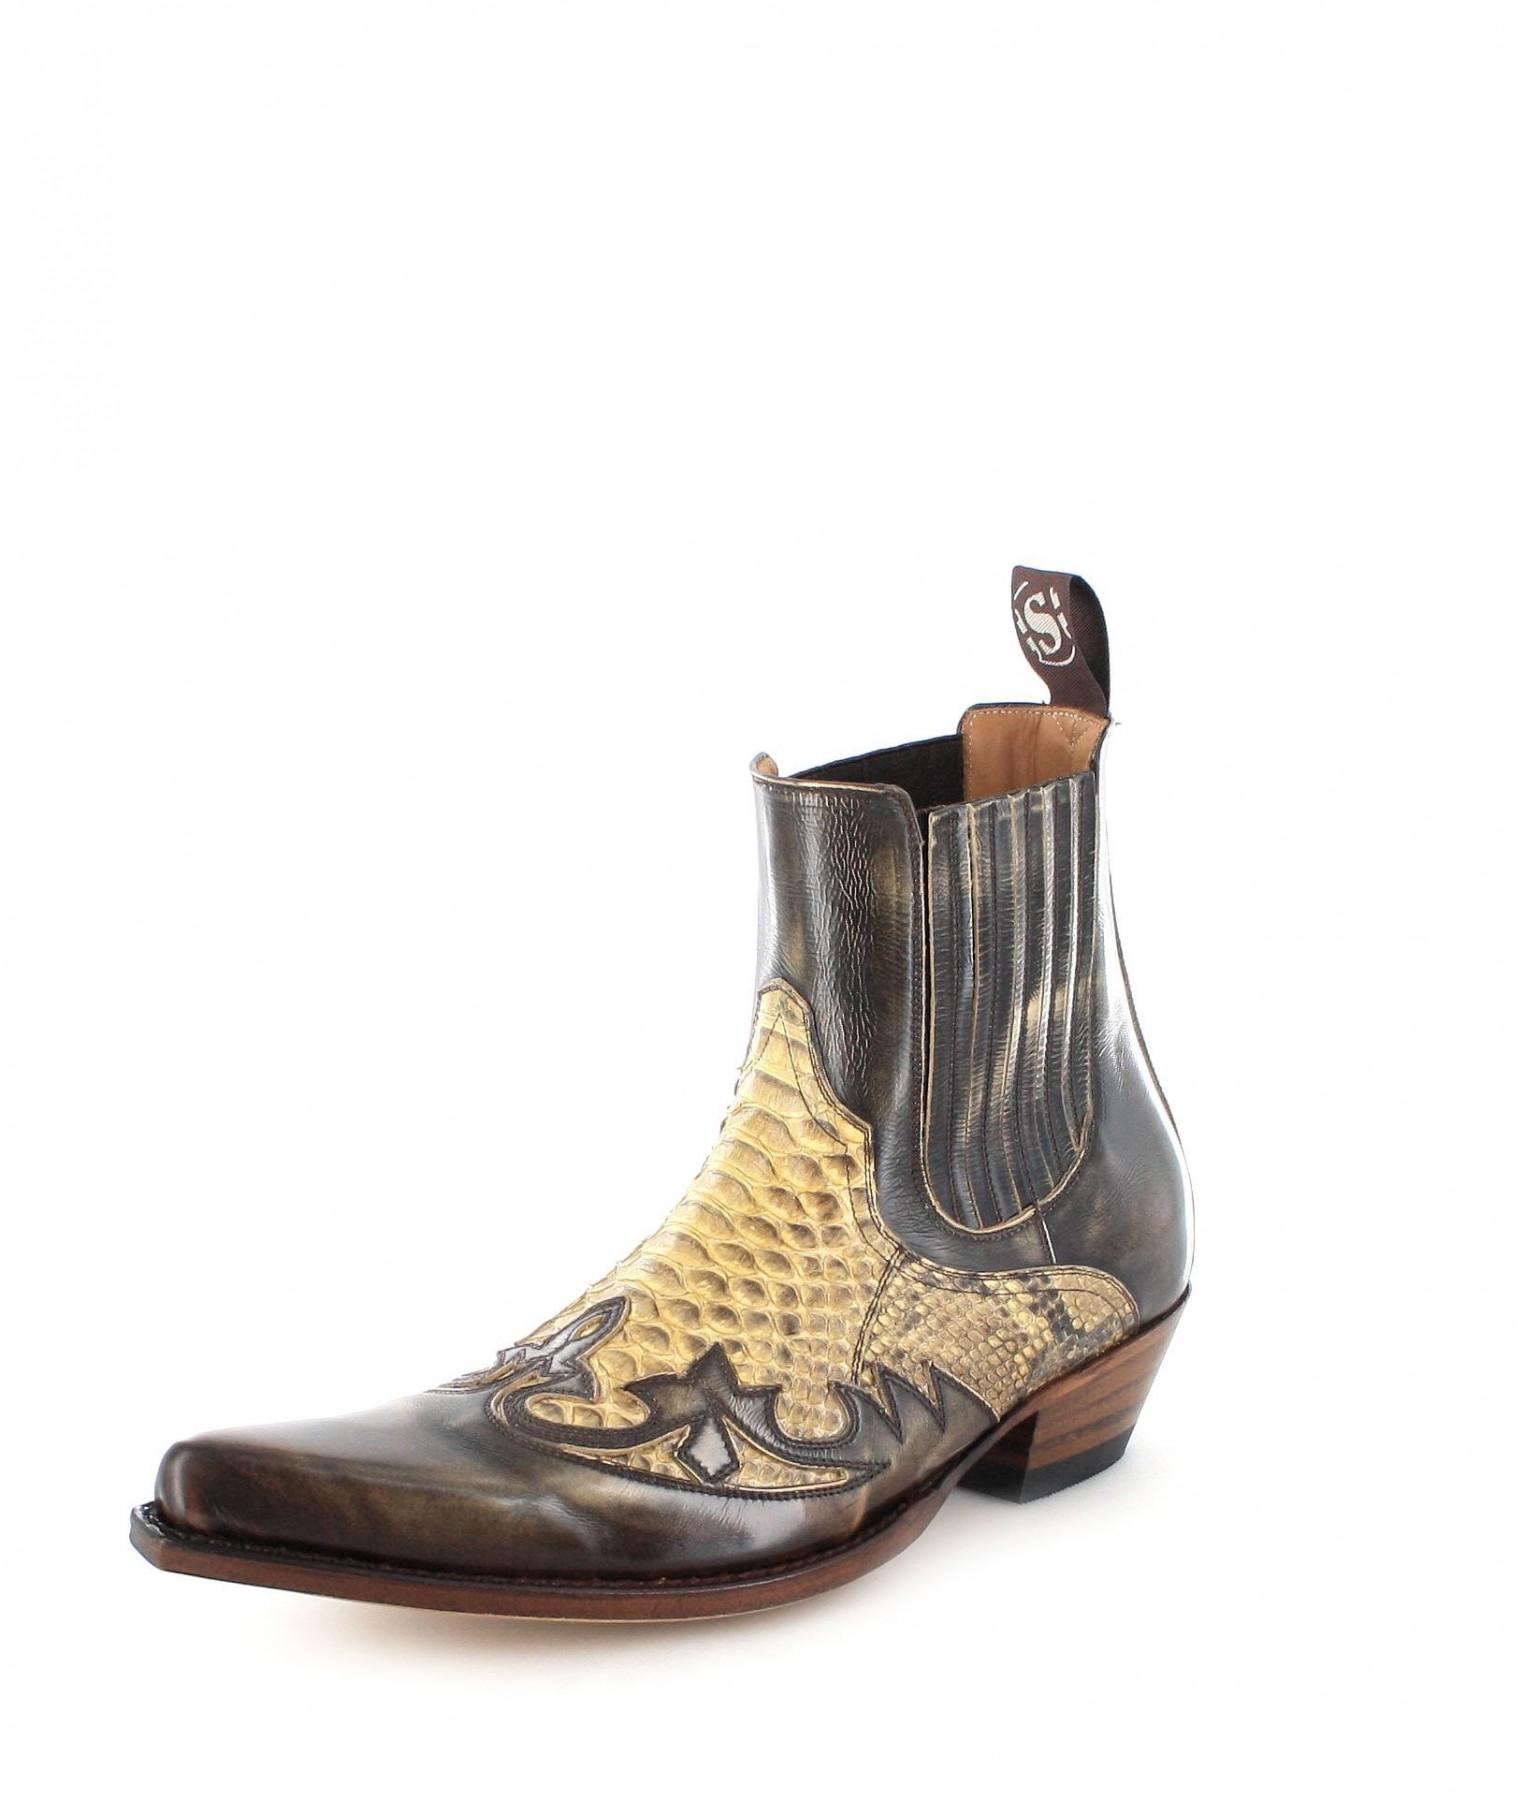 Sendra Boots 9396P Denver 075 Exotic Westernsti...